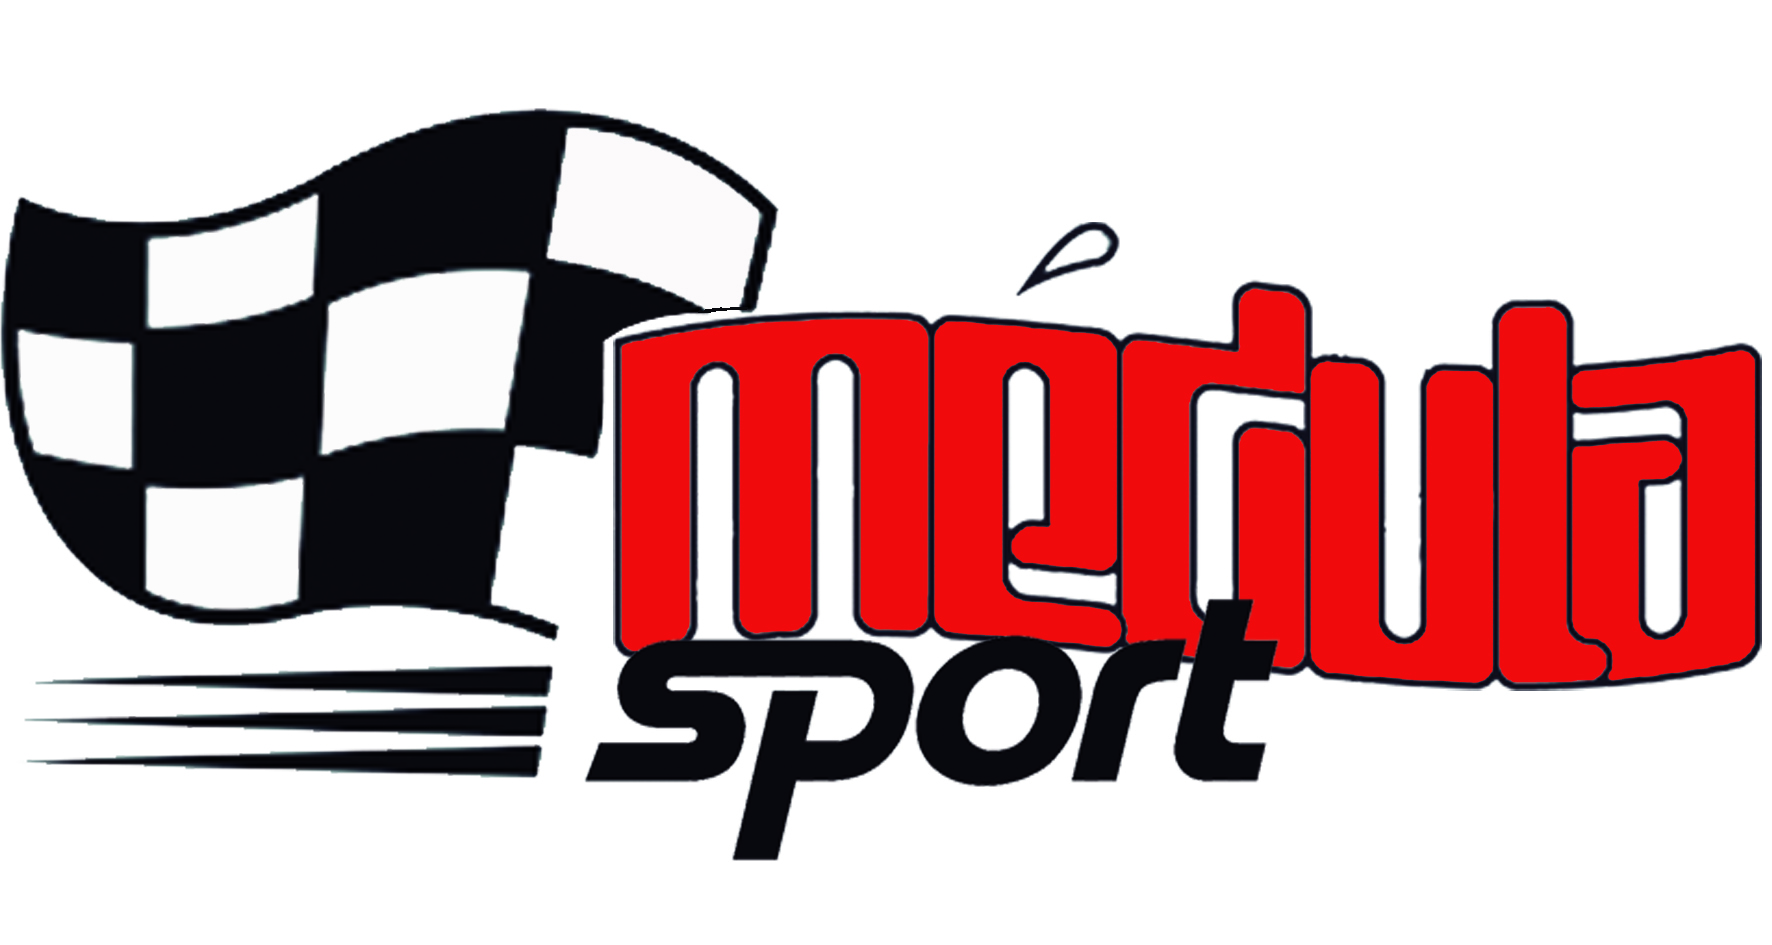 CLUB DEPORTIVO MÉDULA SPORT